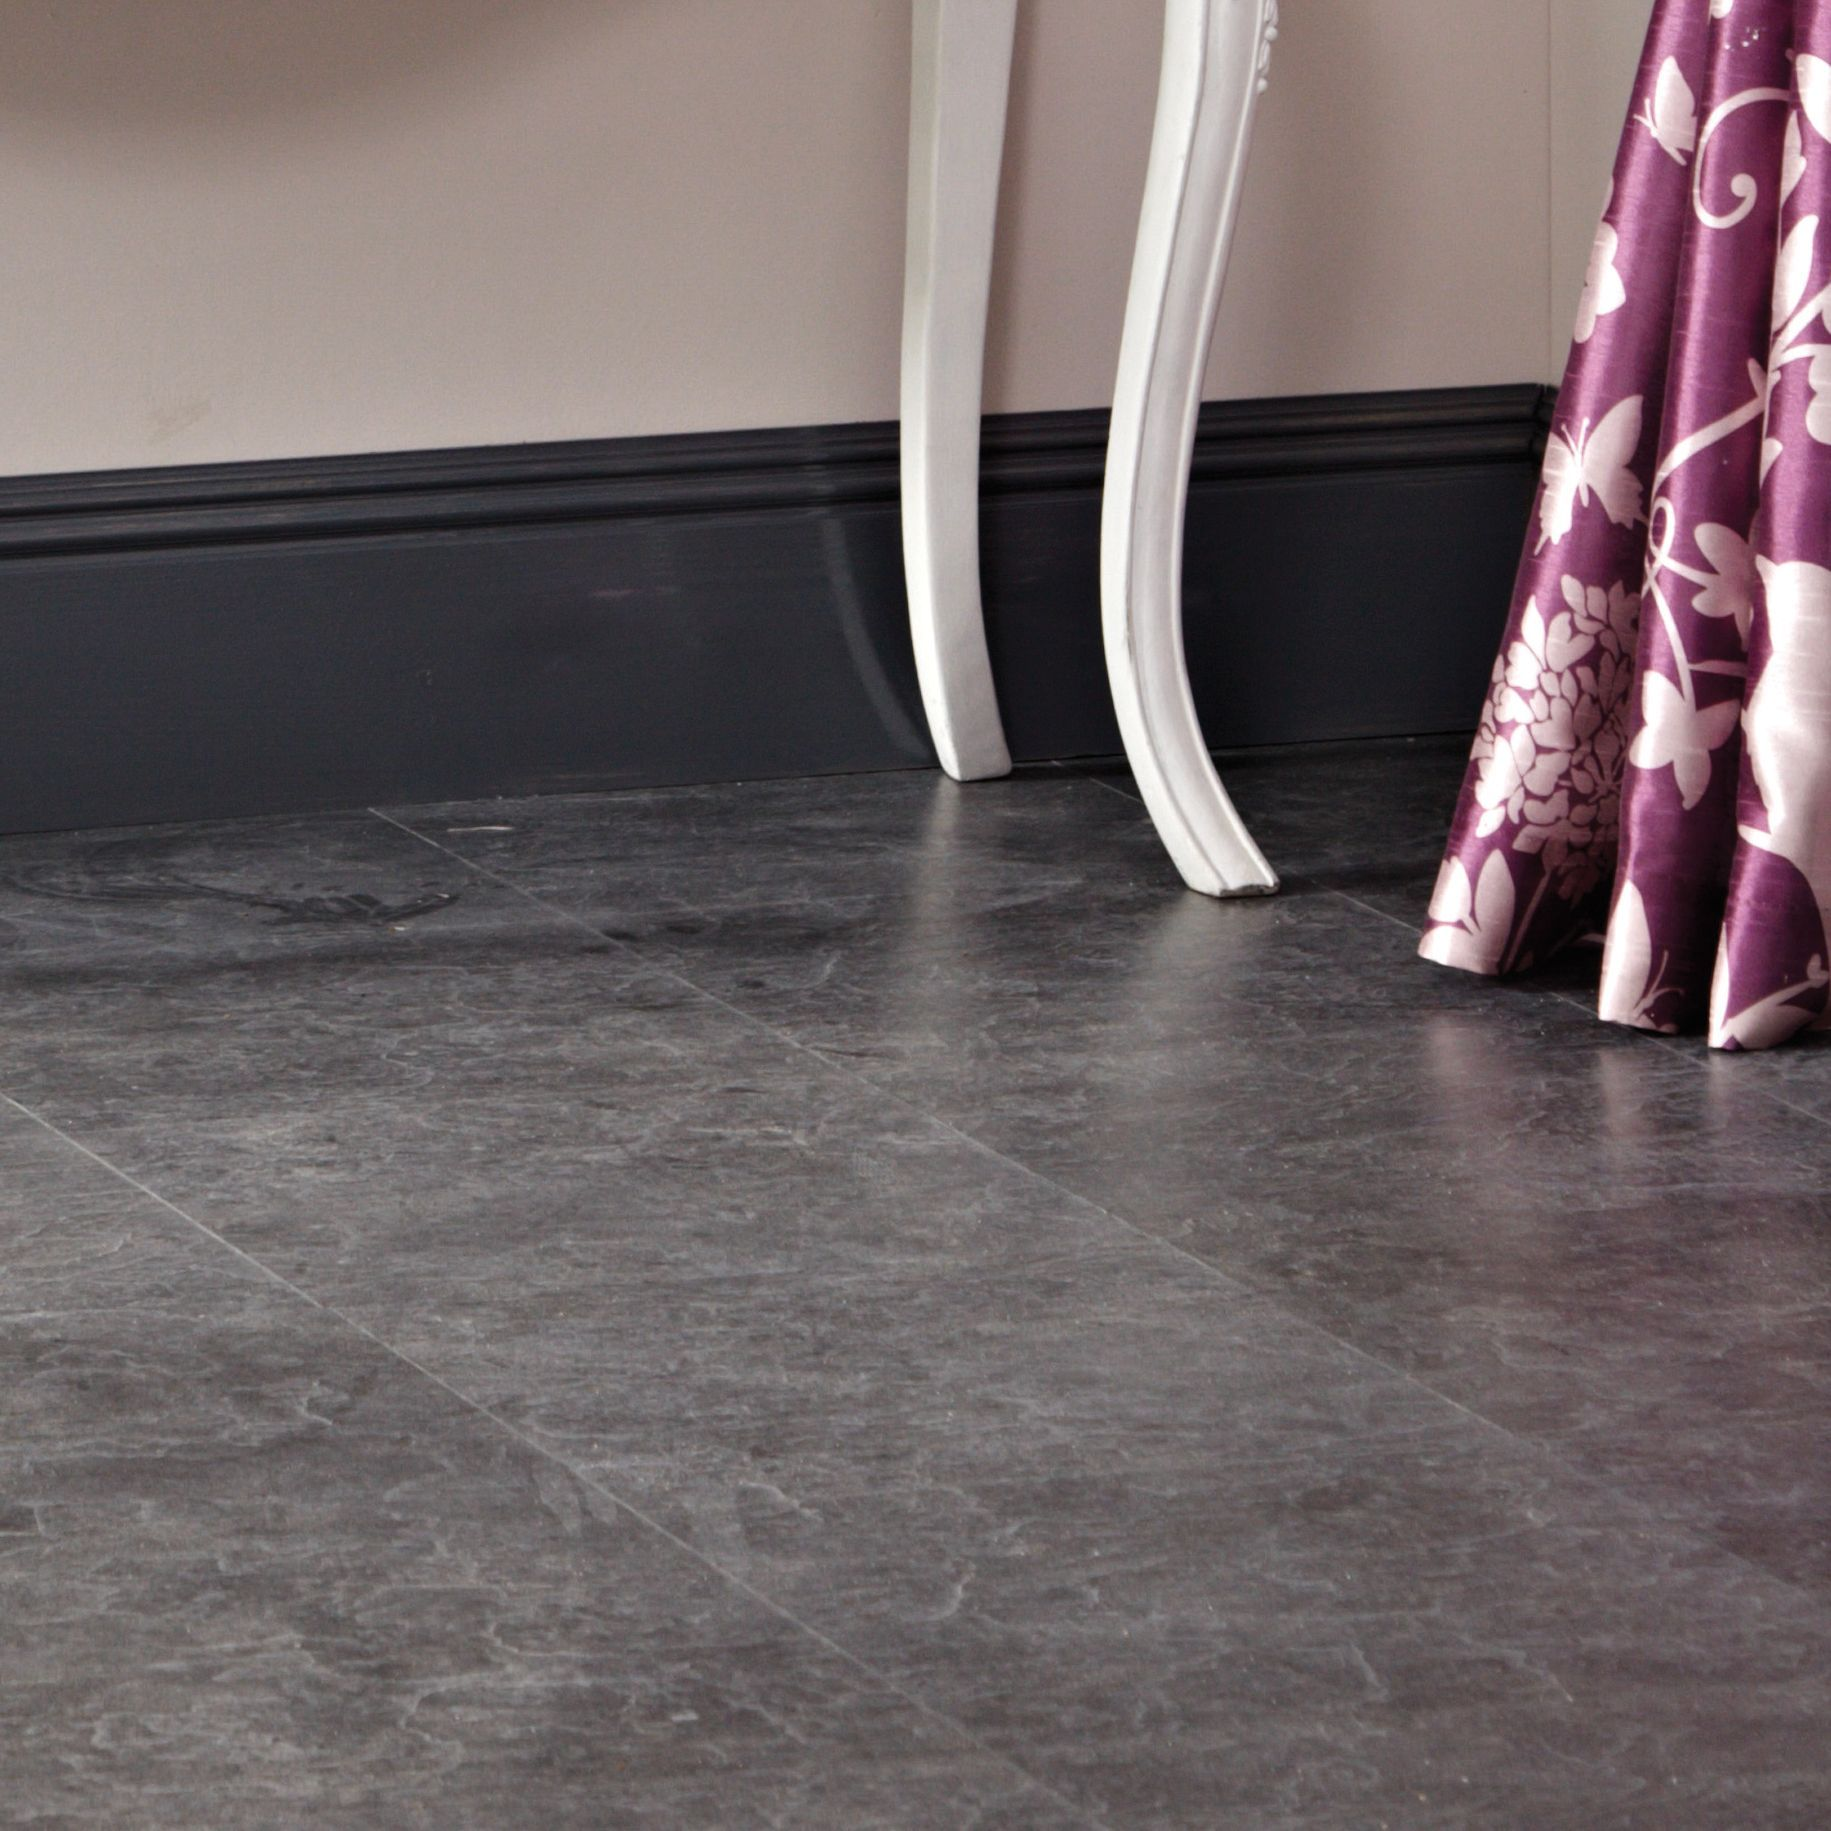 Tila Black Slate Tile Effect Laminate Flooring 1 m² Pack | Departments | DIY at B&Q